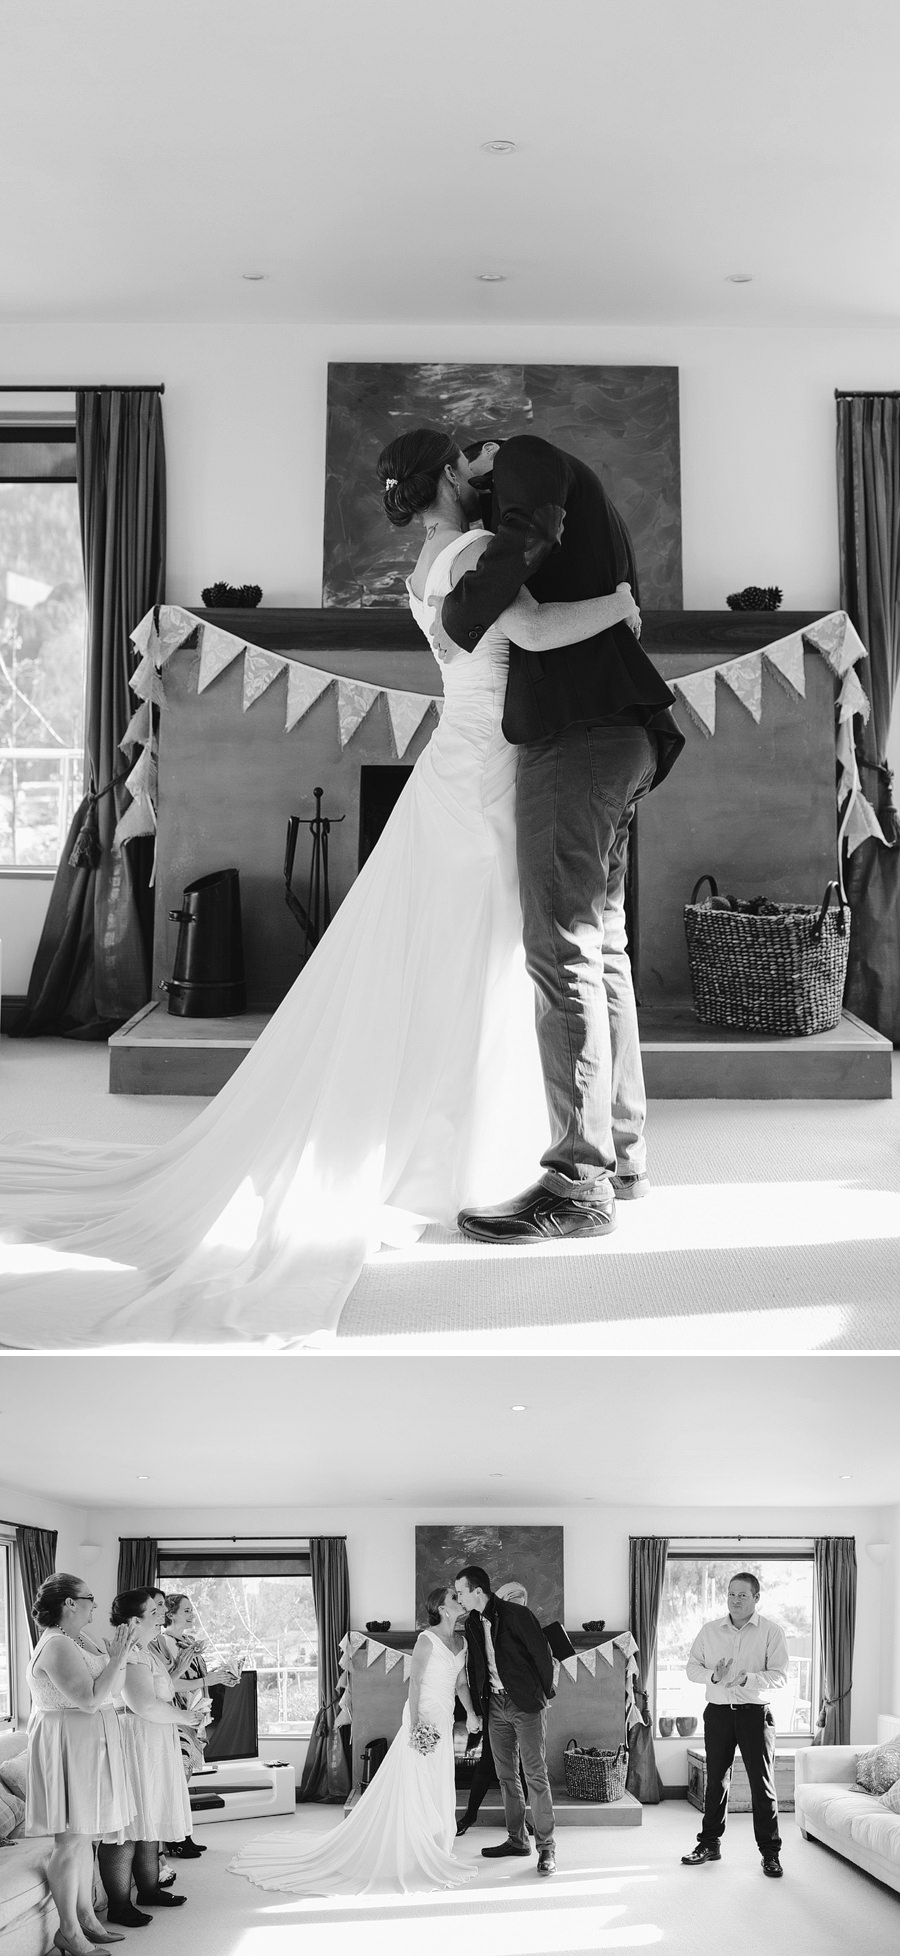 Otago Wedding Photography: Ceremony